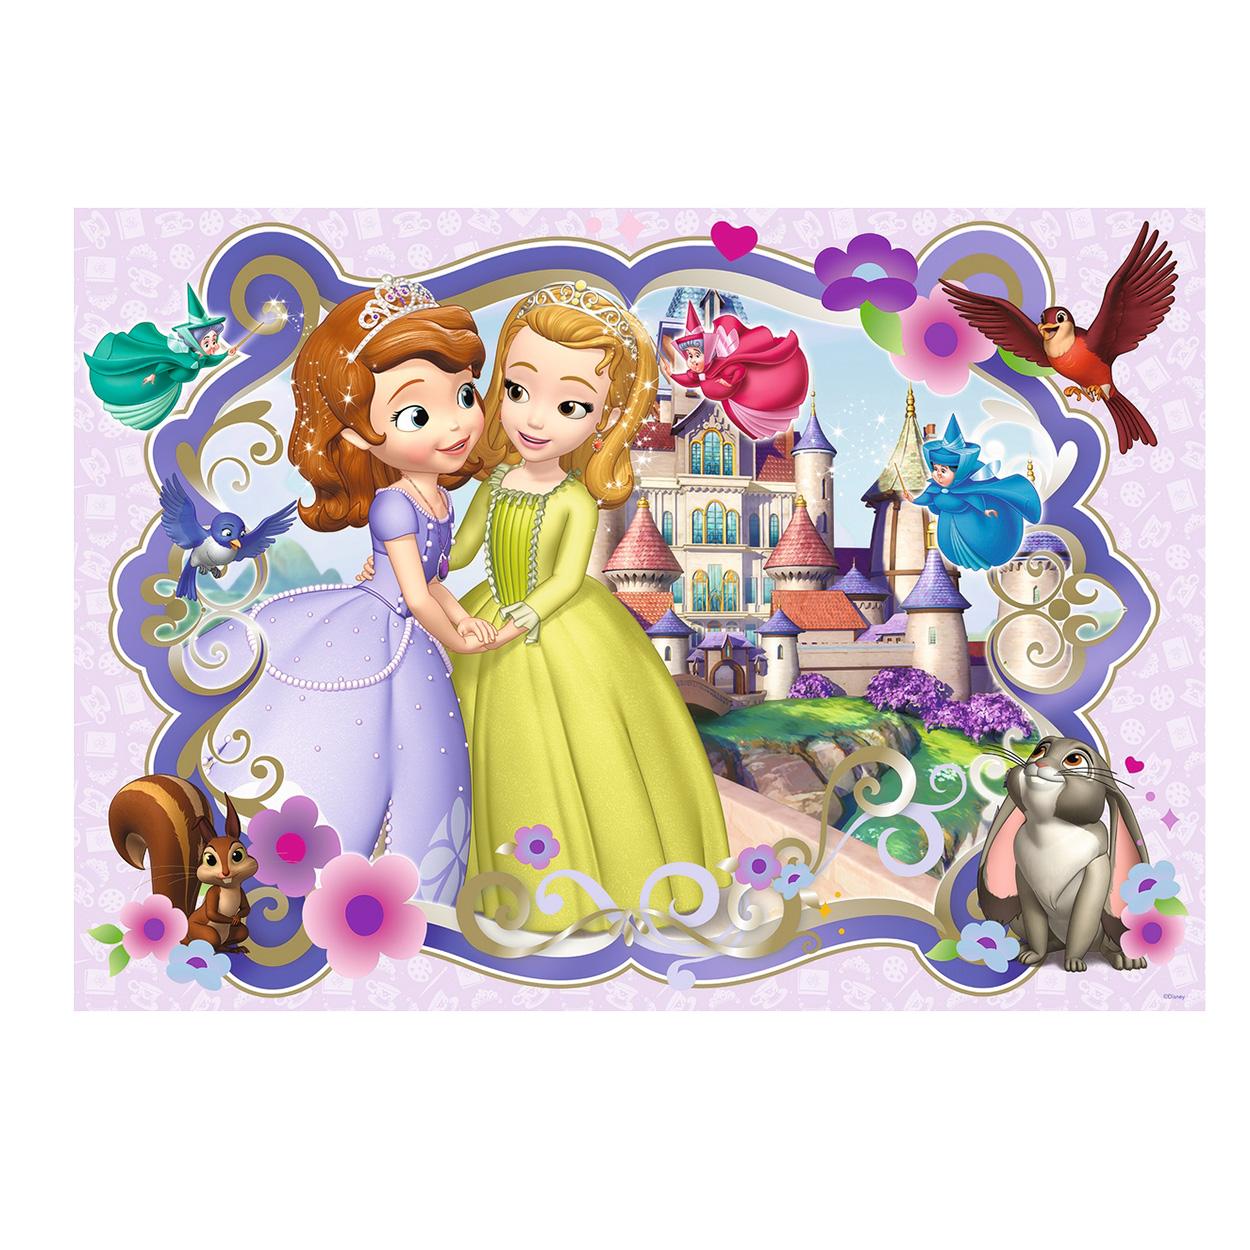 vloerpuzzel sofia het prinsesje 60st kopen